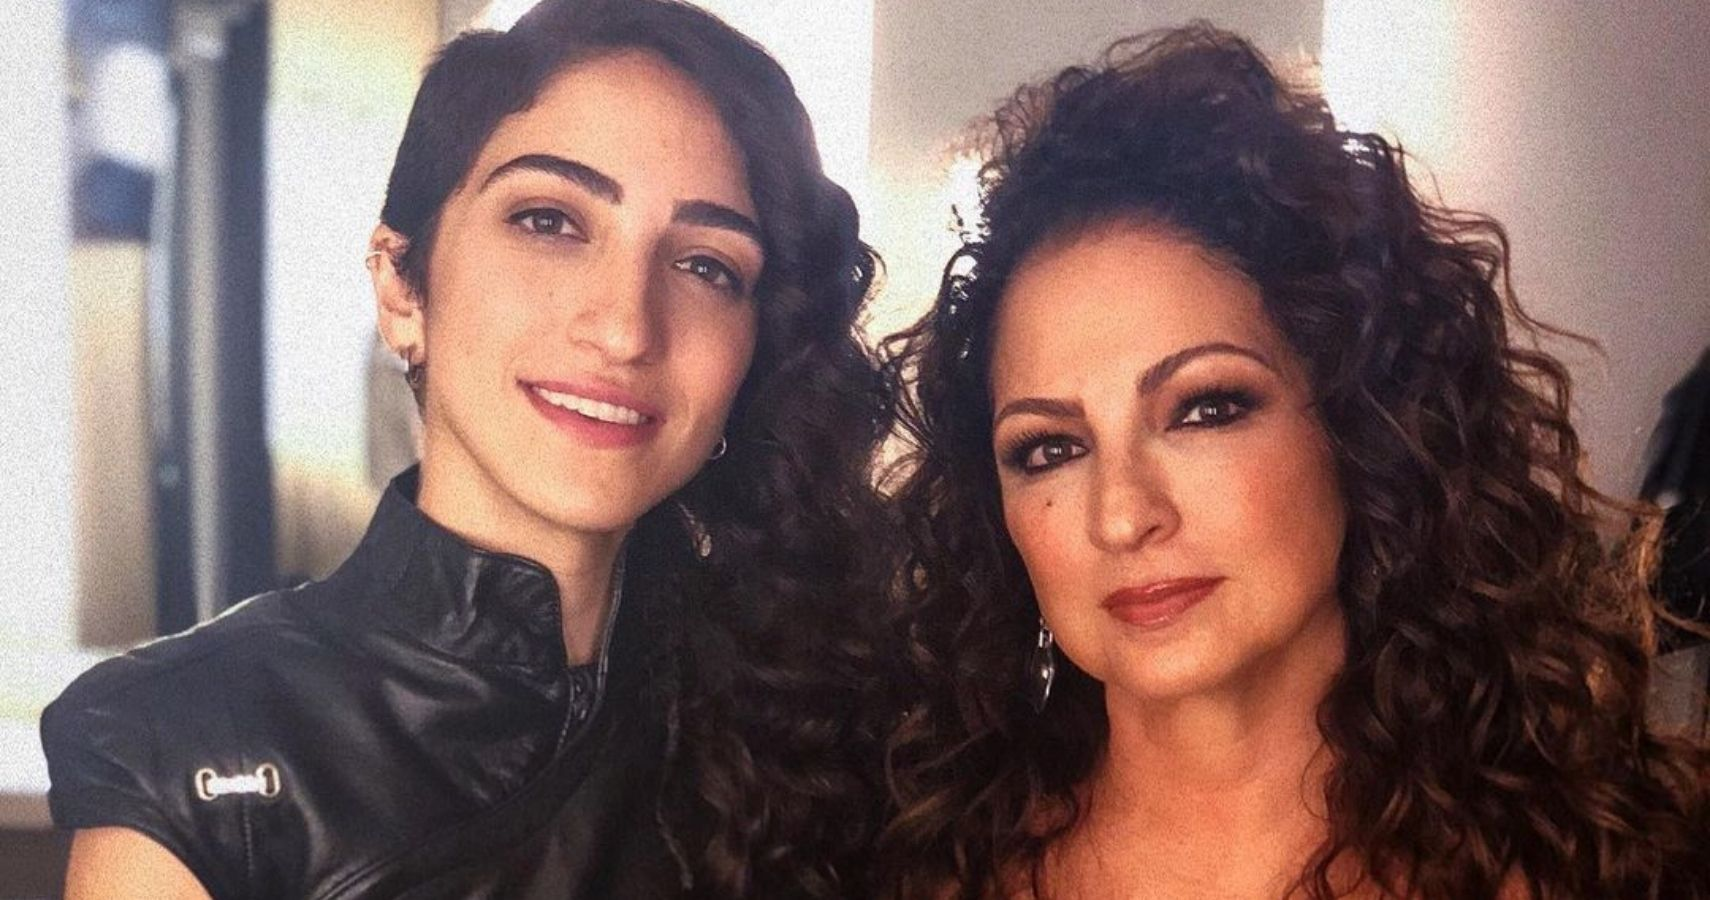 Iconic Musician Gloria Estefan Talks On Daughter's Identity & Facing Own Biases